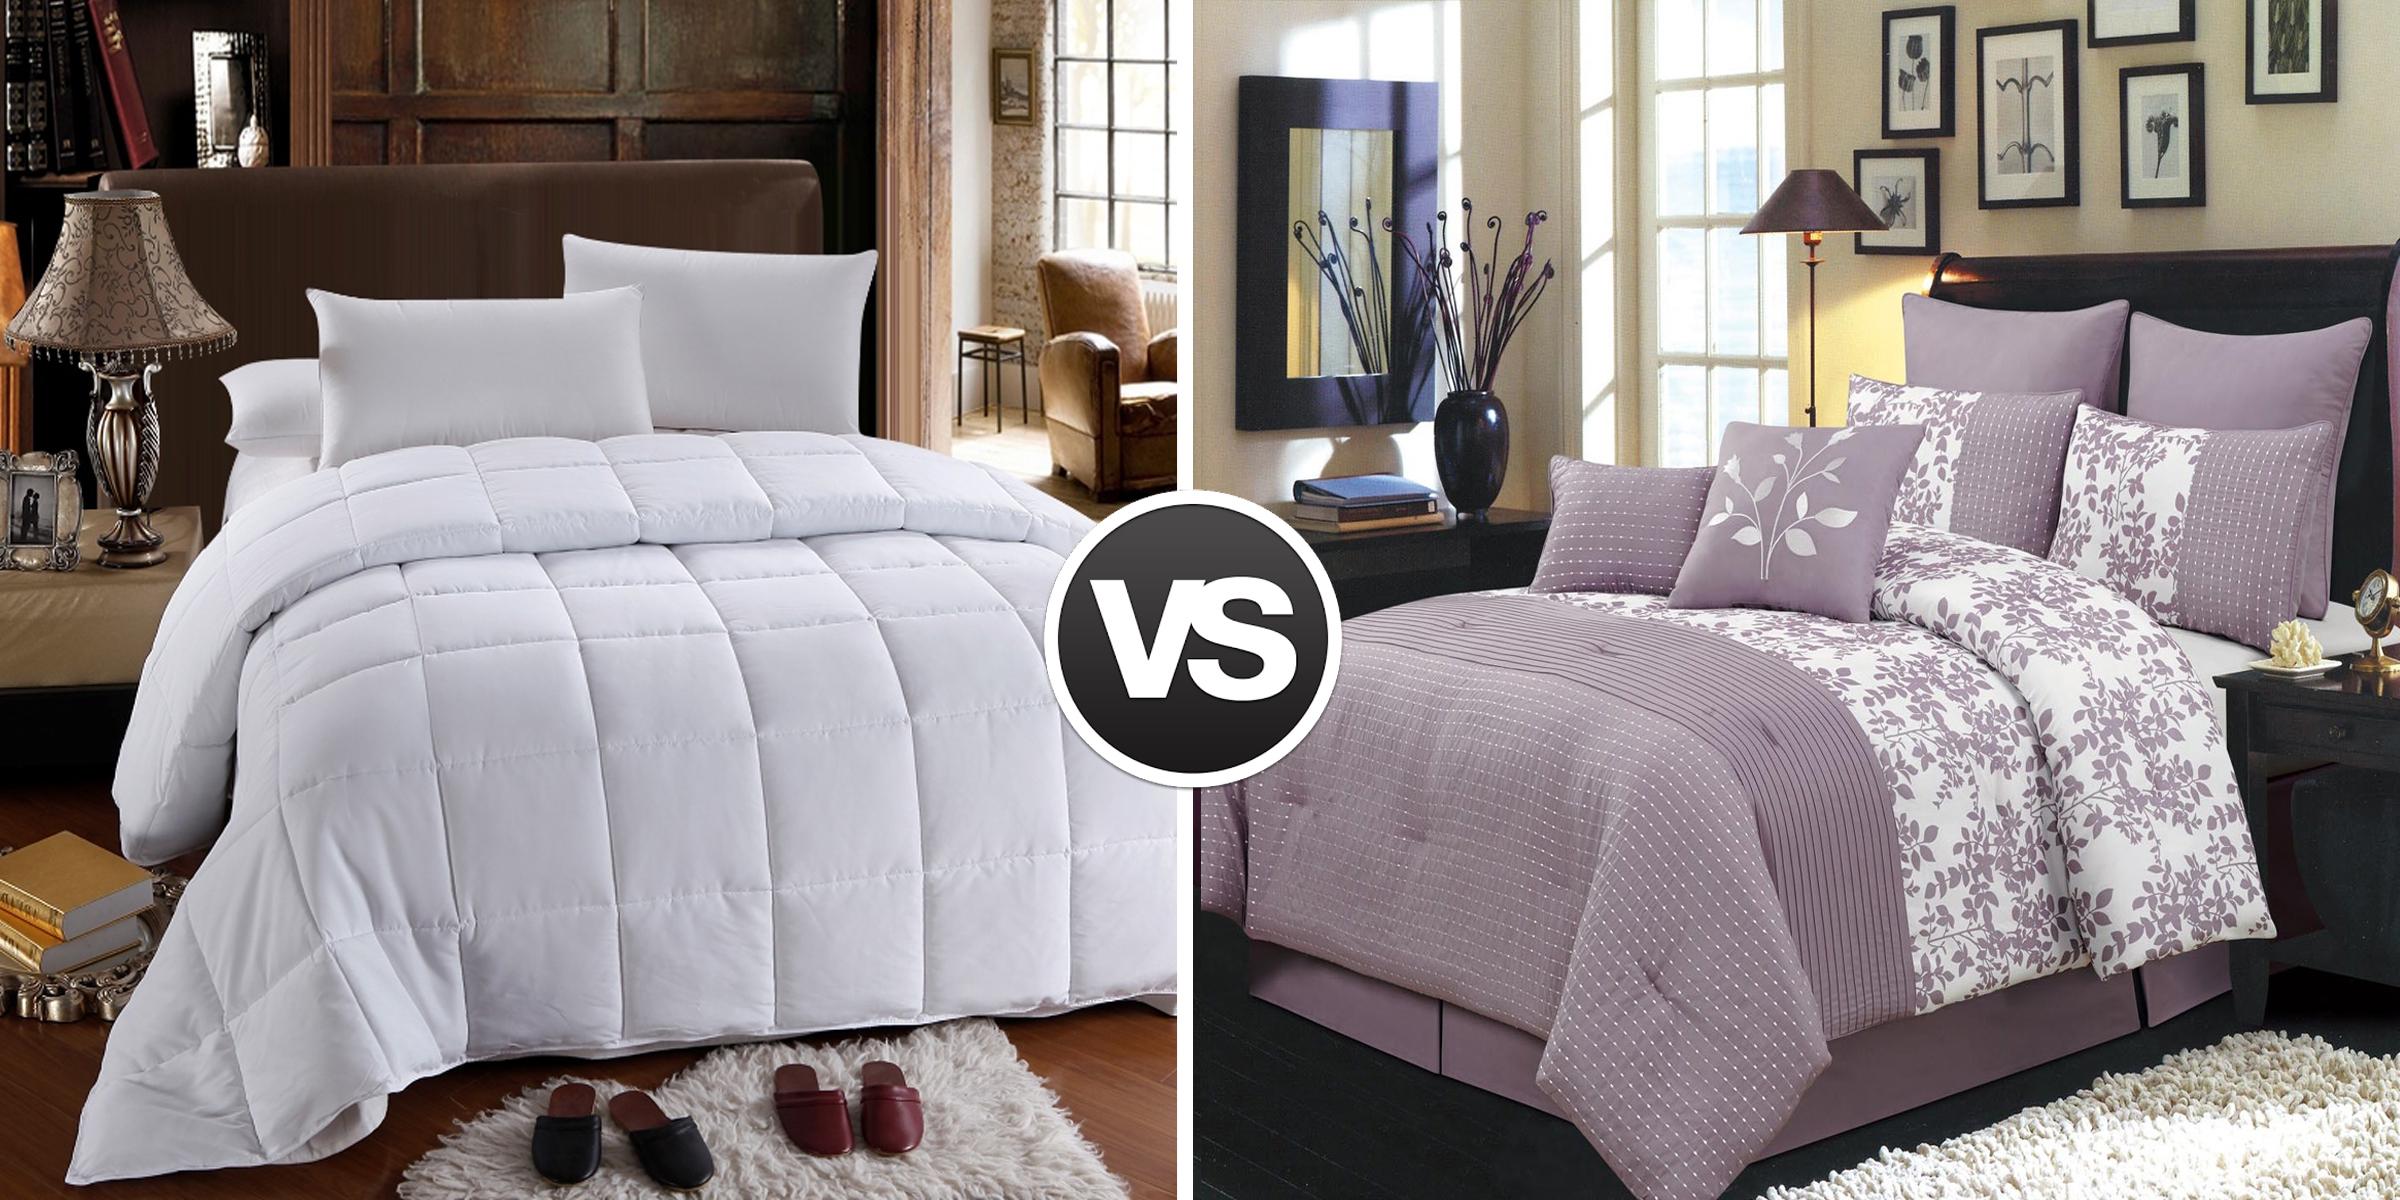 Anna S Linens Annas Linens Online Bedding Towels Home Decor